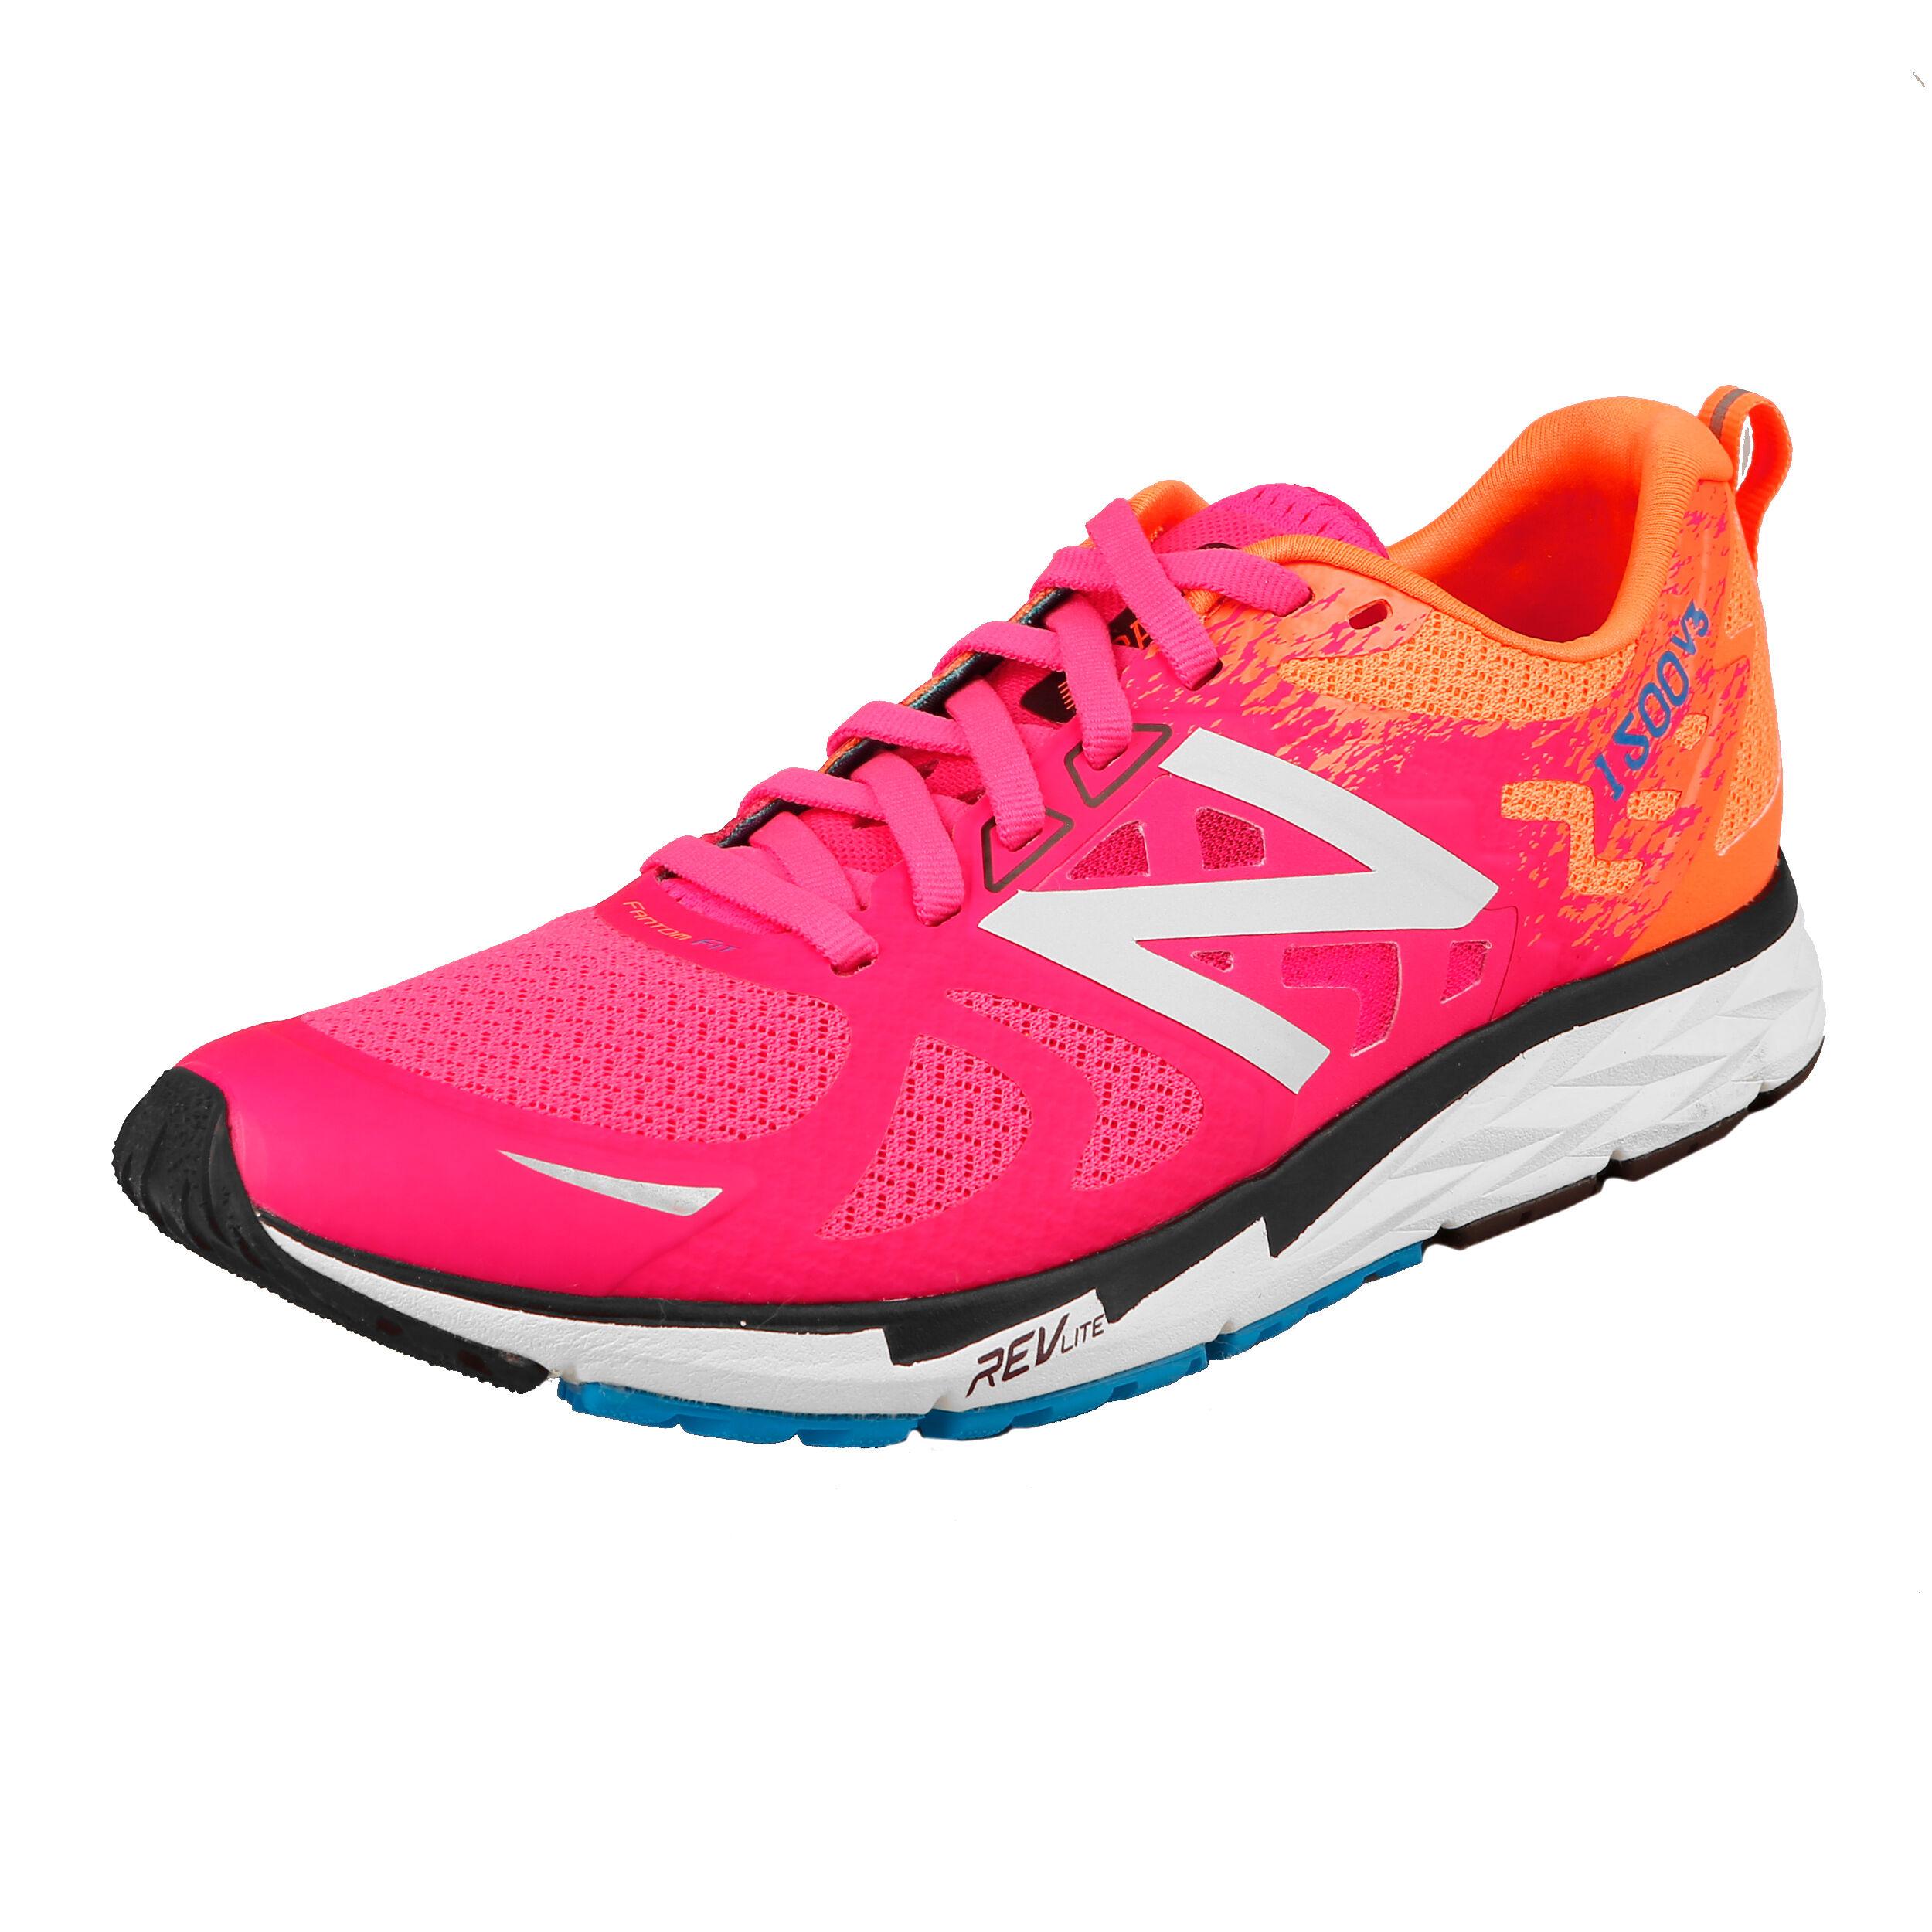 New Balance NBx Competition 1500 V3 Wettkampfschuh Damen - Pink ...